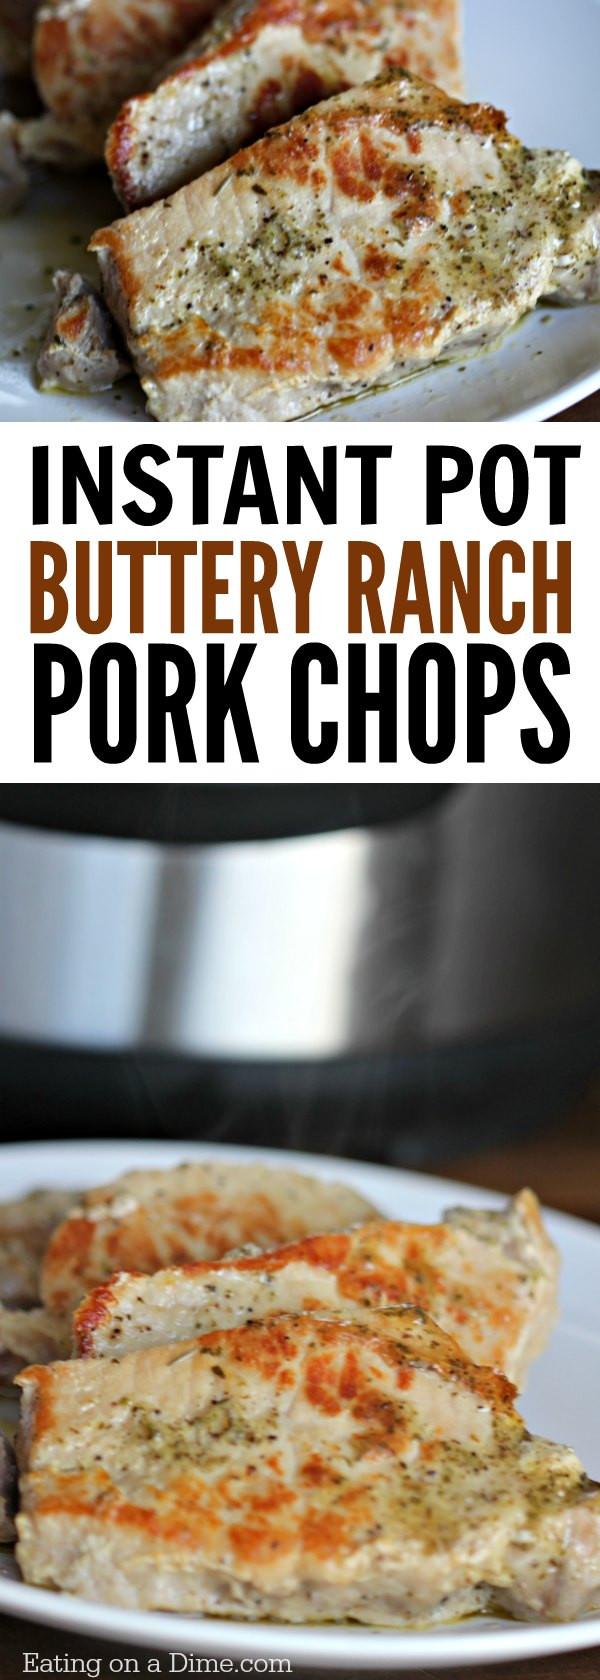 Instant Pot Boneless Pork Chops  Instant Pot Boneless Pork Chops Recipe Eating on a Dime